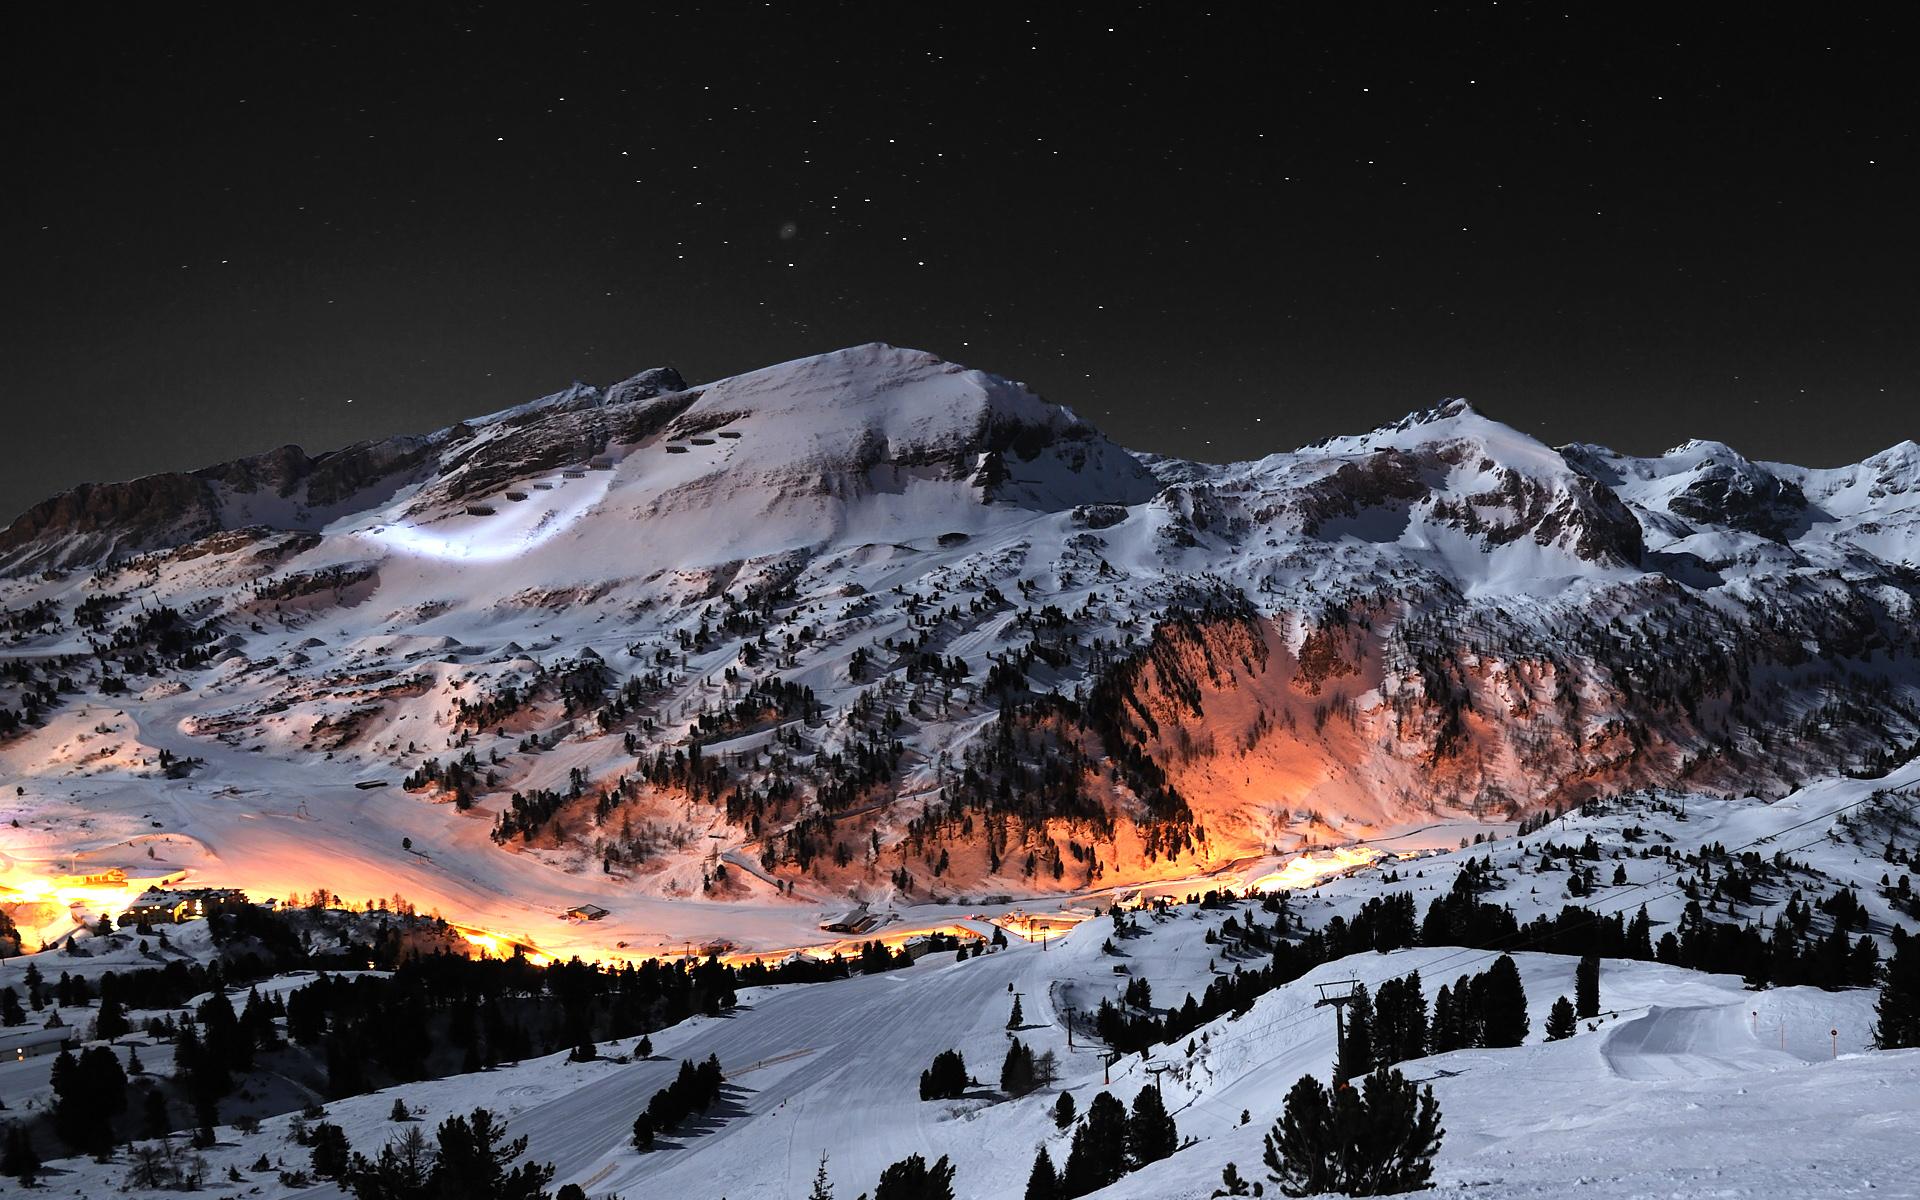 wallpaper Snow Mountains Desktop Backgrounds hd wallpaper background 1920x1200